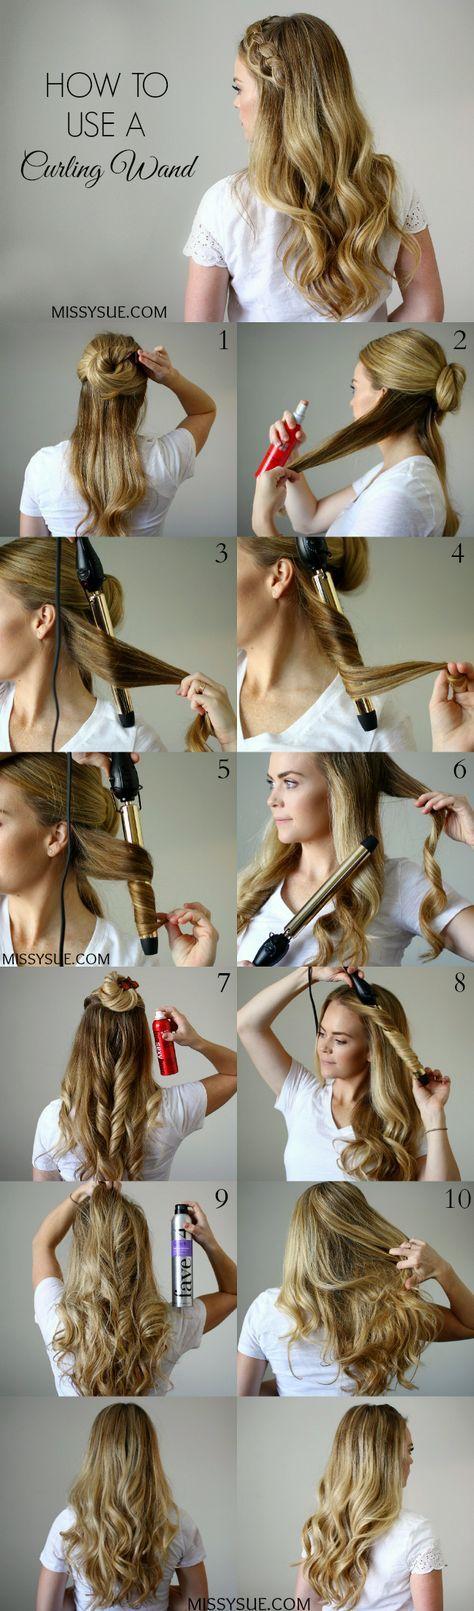 ghd curve creative curl wand tutorial